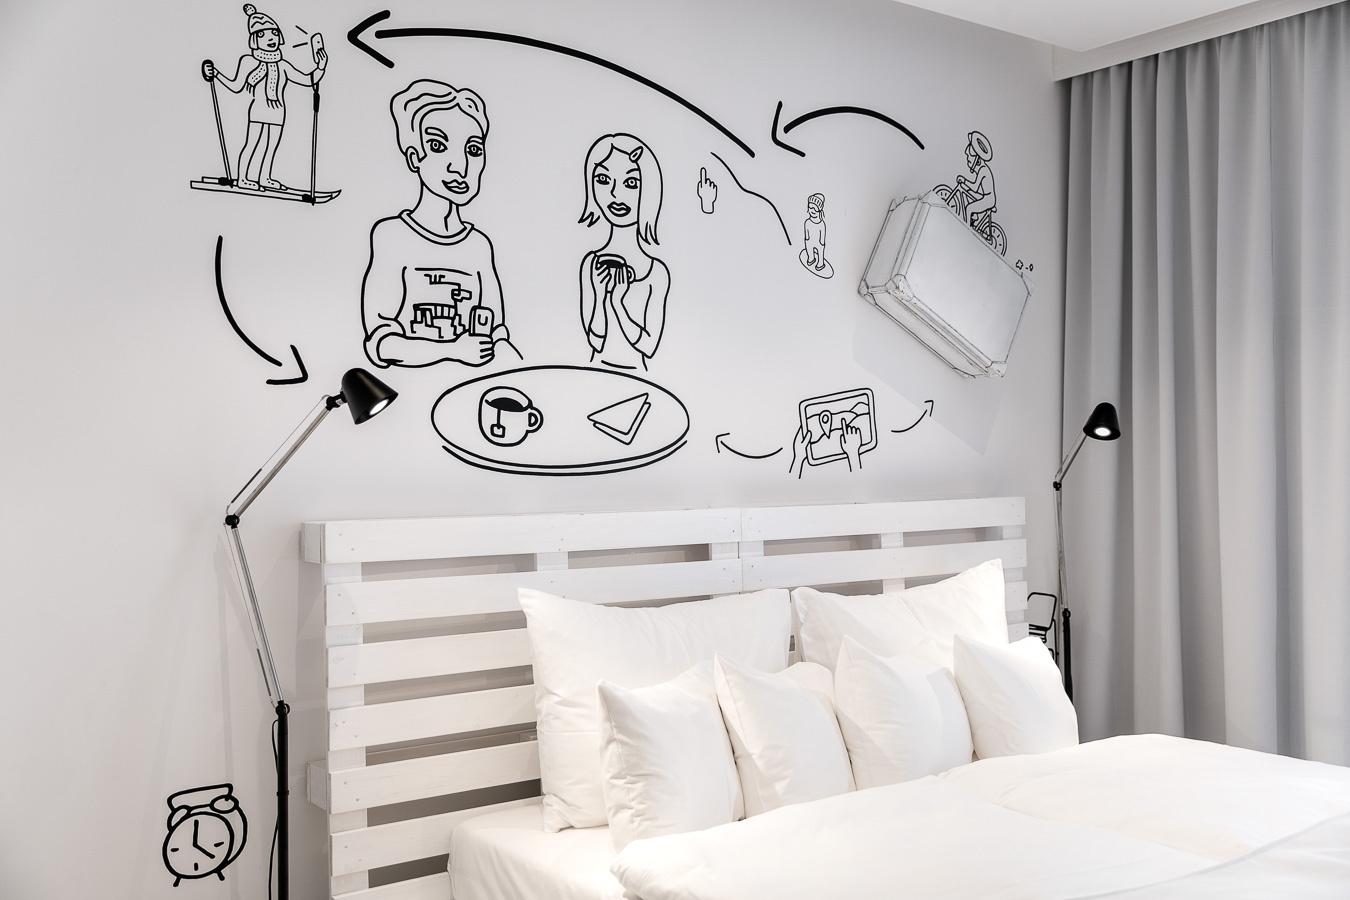 Hotel Pytloun – Izba číslo 218